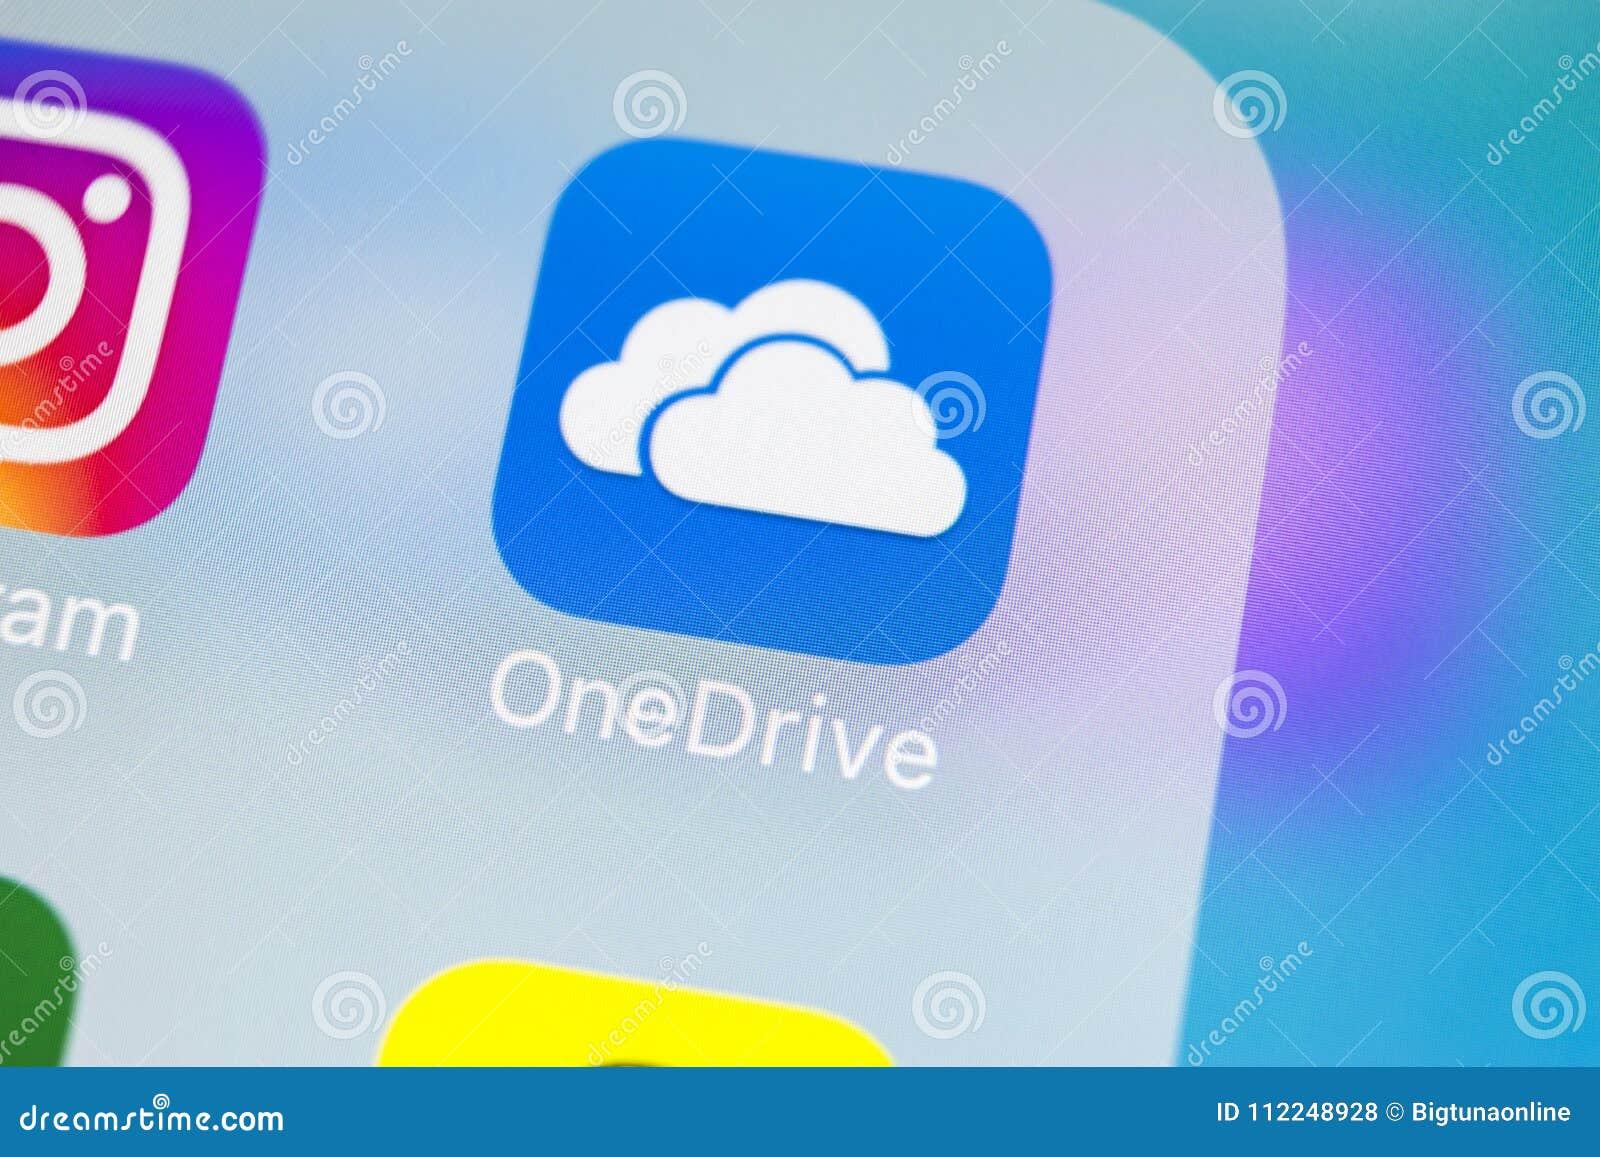 Microsoft OneDrive Application Icon On Apple IPhone X Screen Close